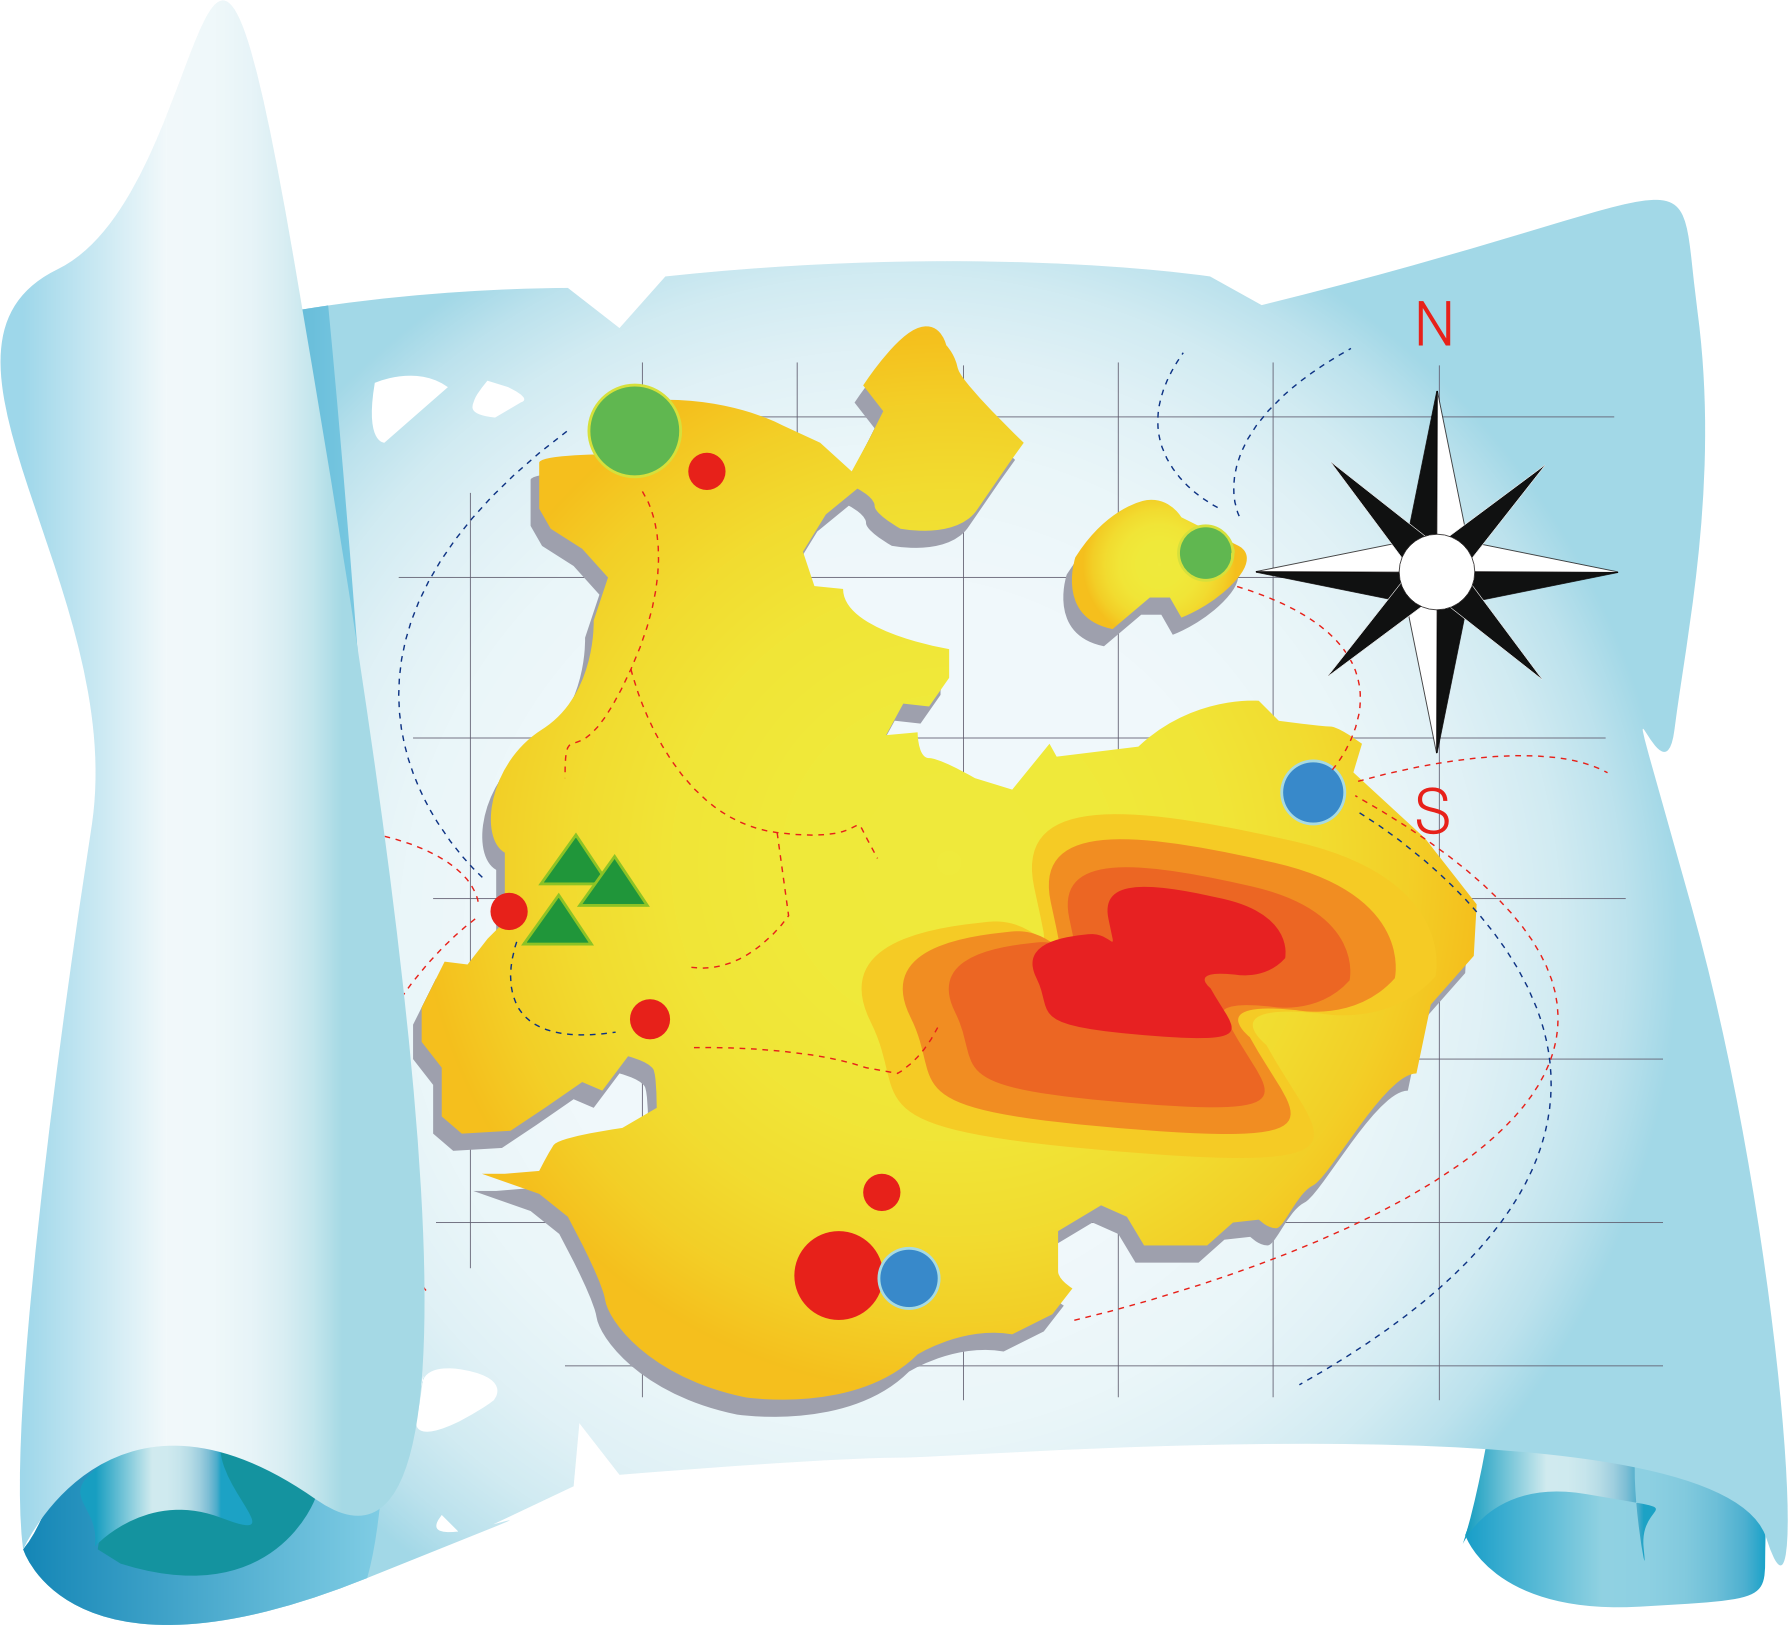 Google map images clipart graphic transparent download Clipart - travel map graphic transparent download